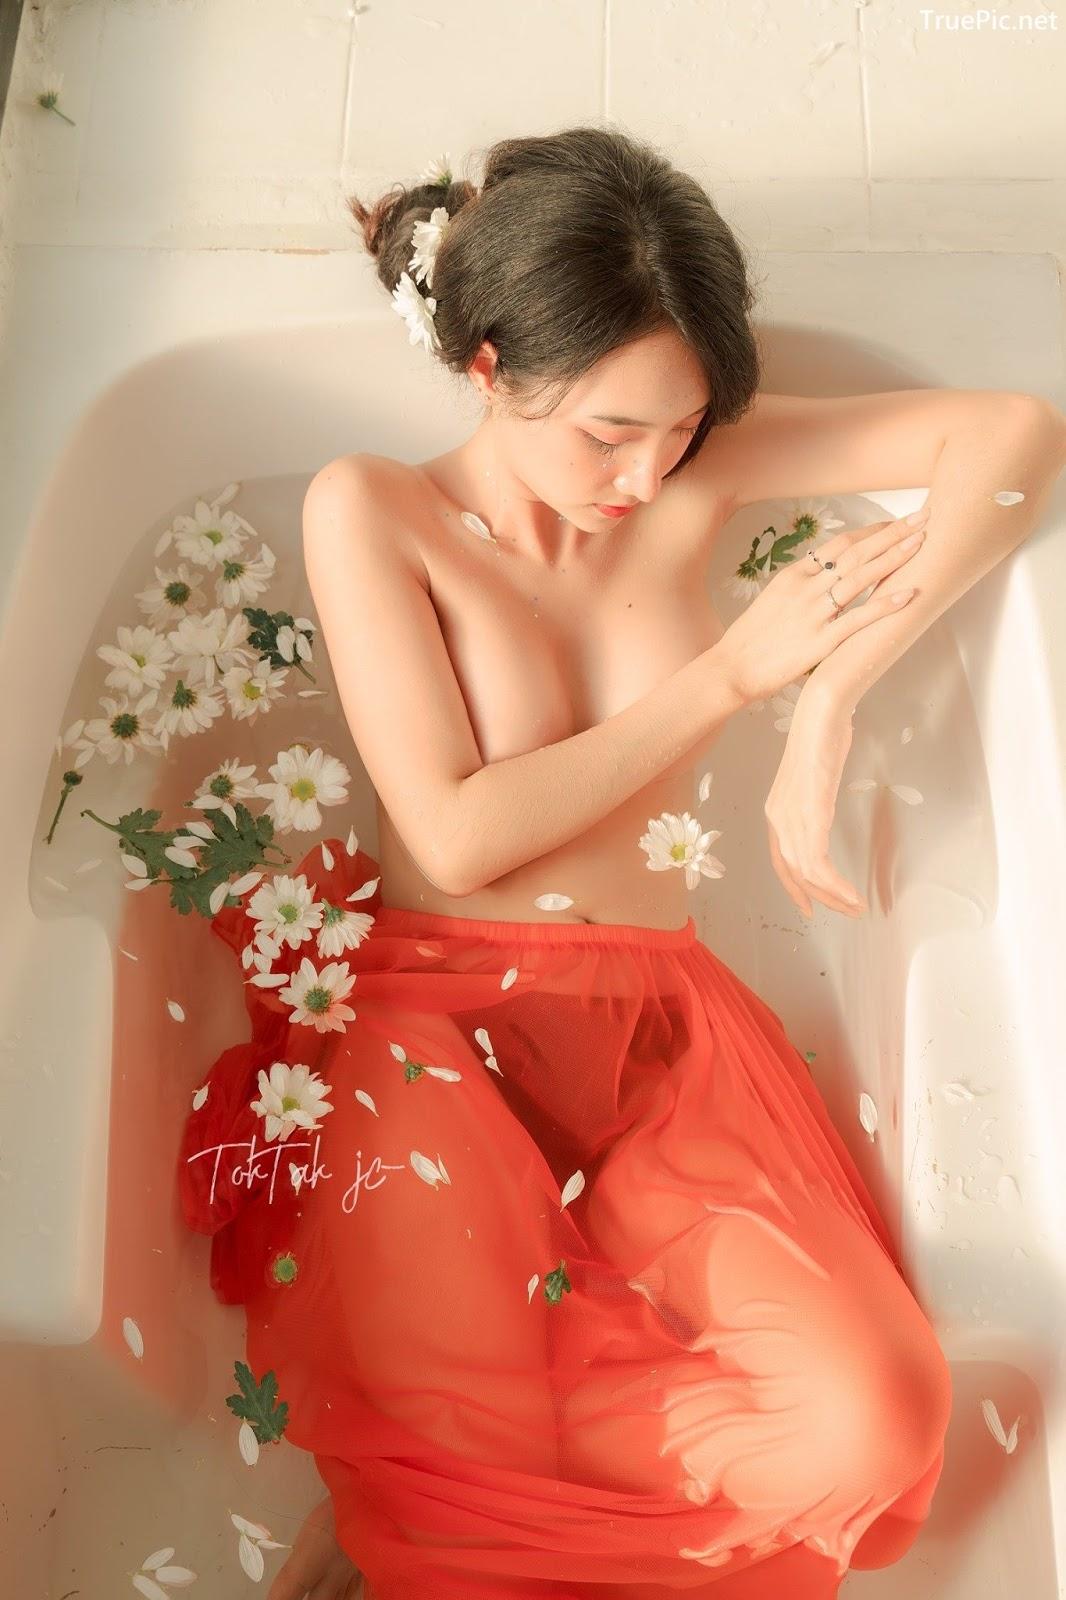 Image-Thailand-Beautiful-Model-Piyatida-Rotjutharak-The-Muse-Concept-TruePic.net- Picture-9